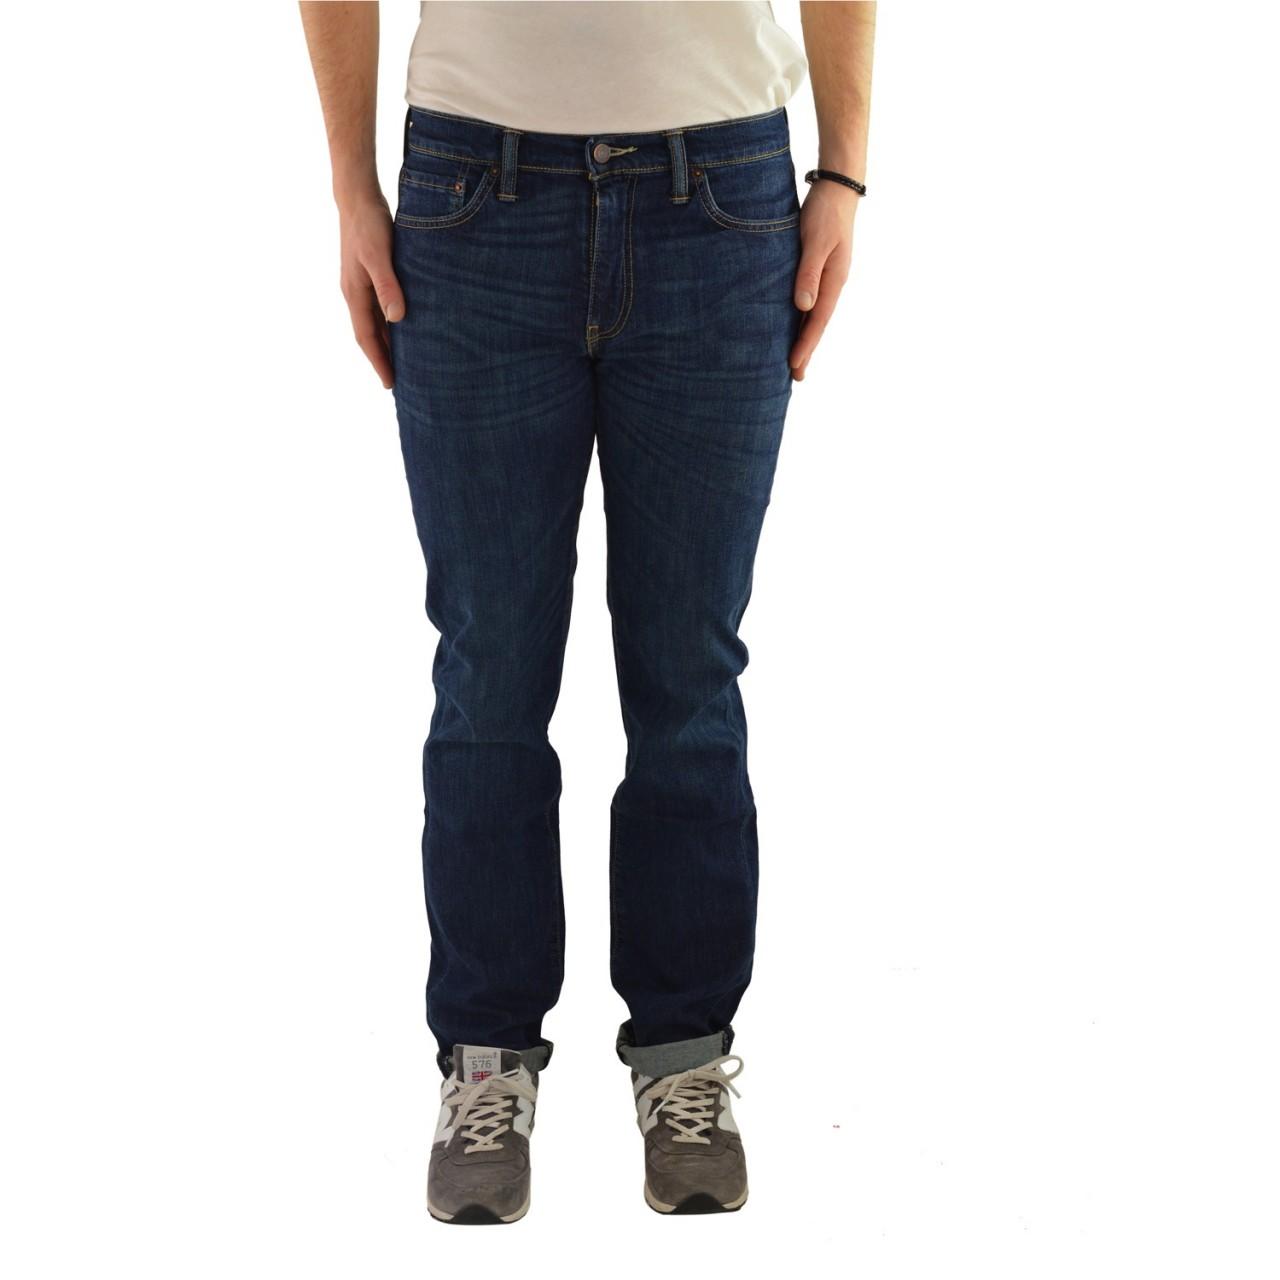 Levi's Uomo Jeans Levi's Uomo 511 Slim Fit Rain Shower 5110709B